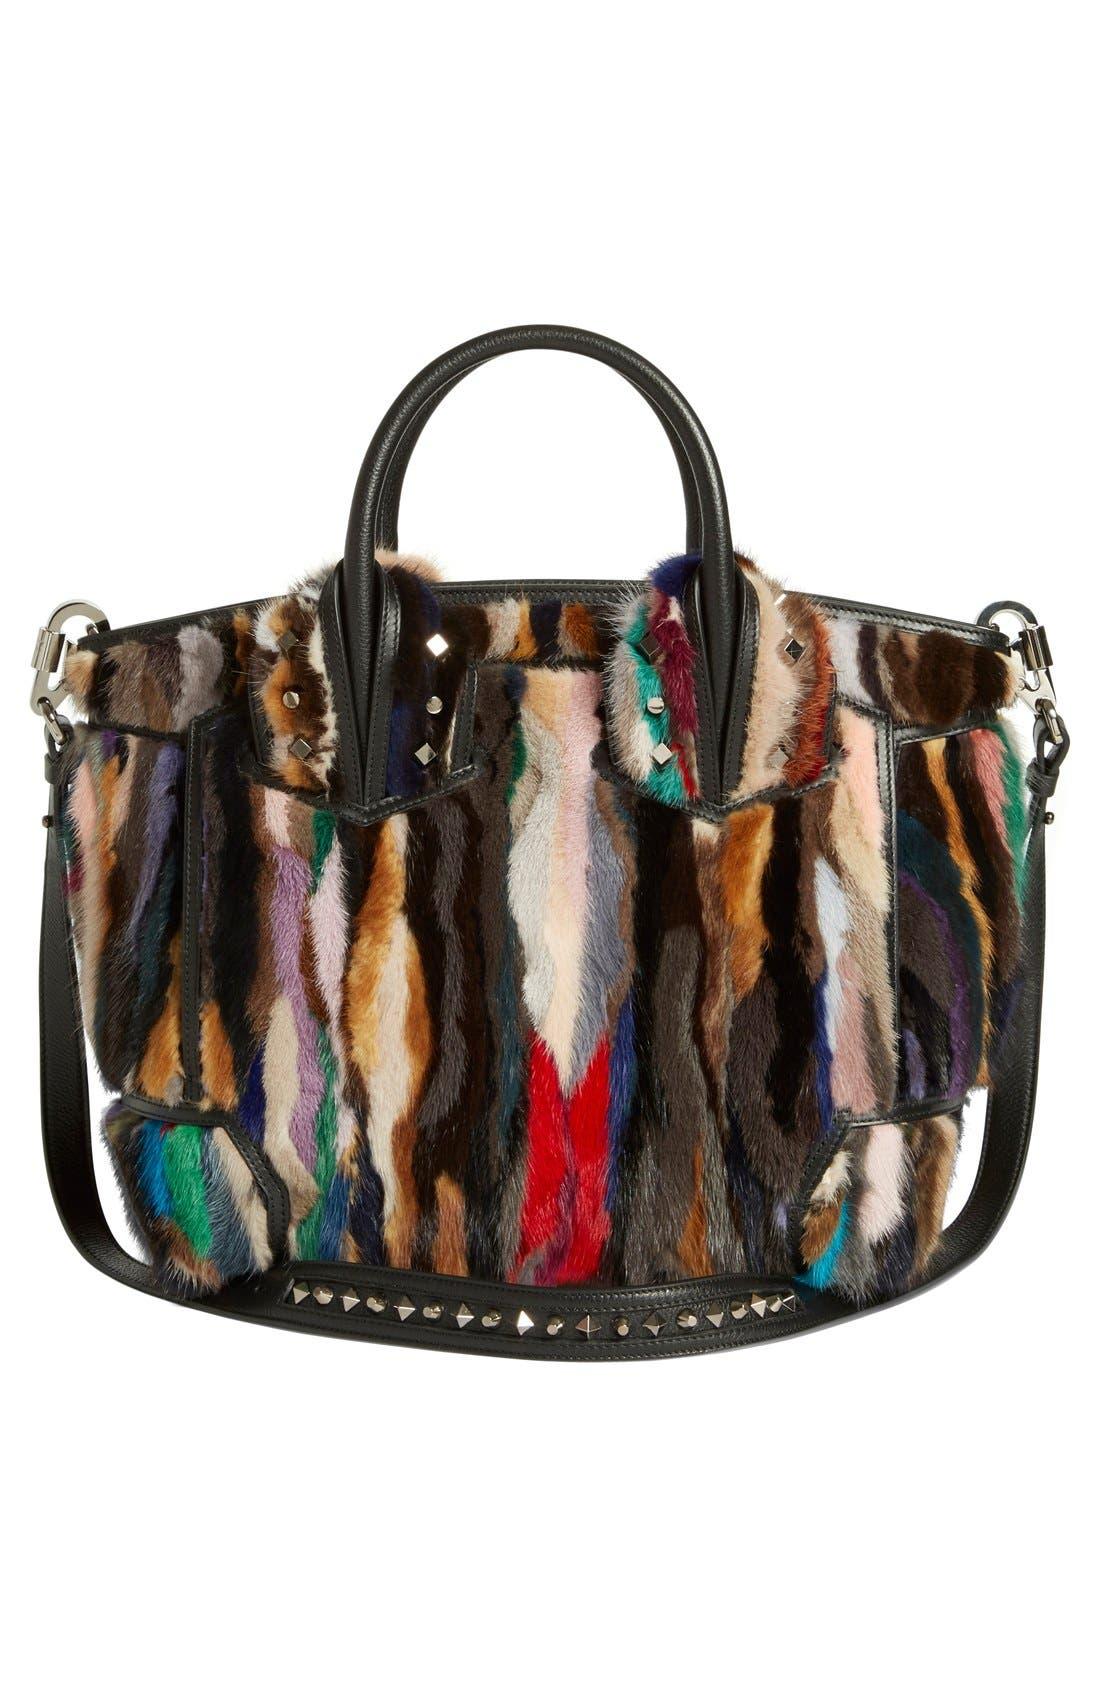 CHRISTIAN LOUBOUTIN,                             'Large Eloise' Studded Leather & Genuine Mink Fur Satchel,                             Alternate thumbnail 4, color,                             002